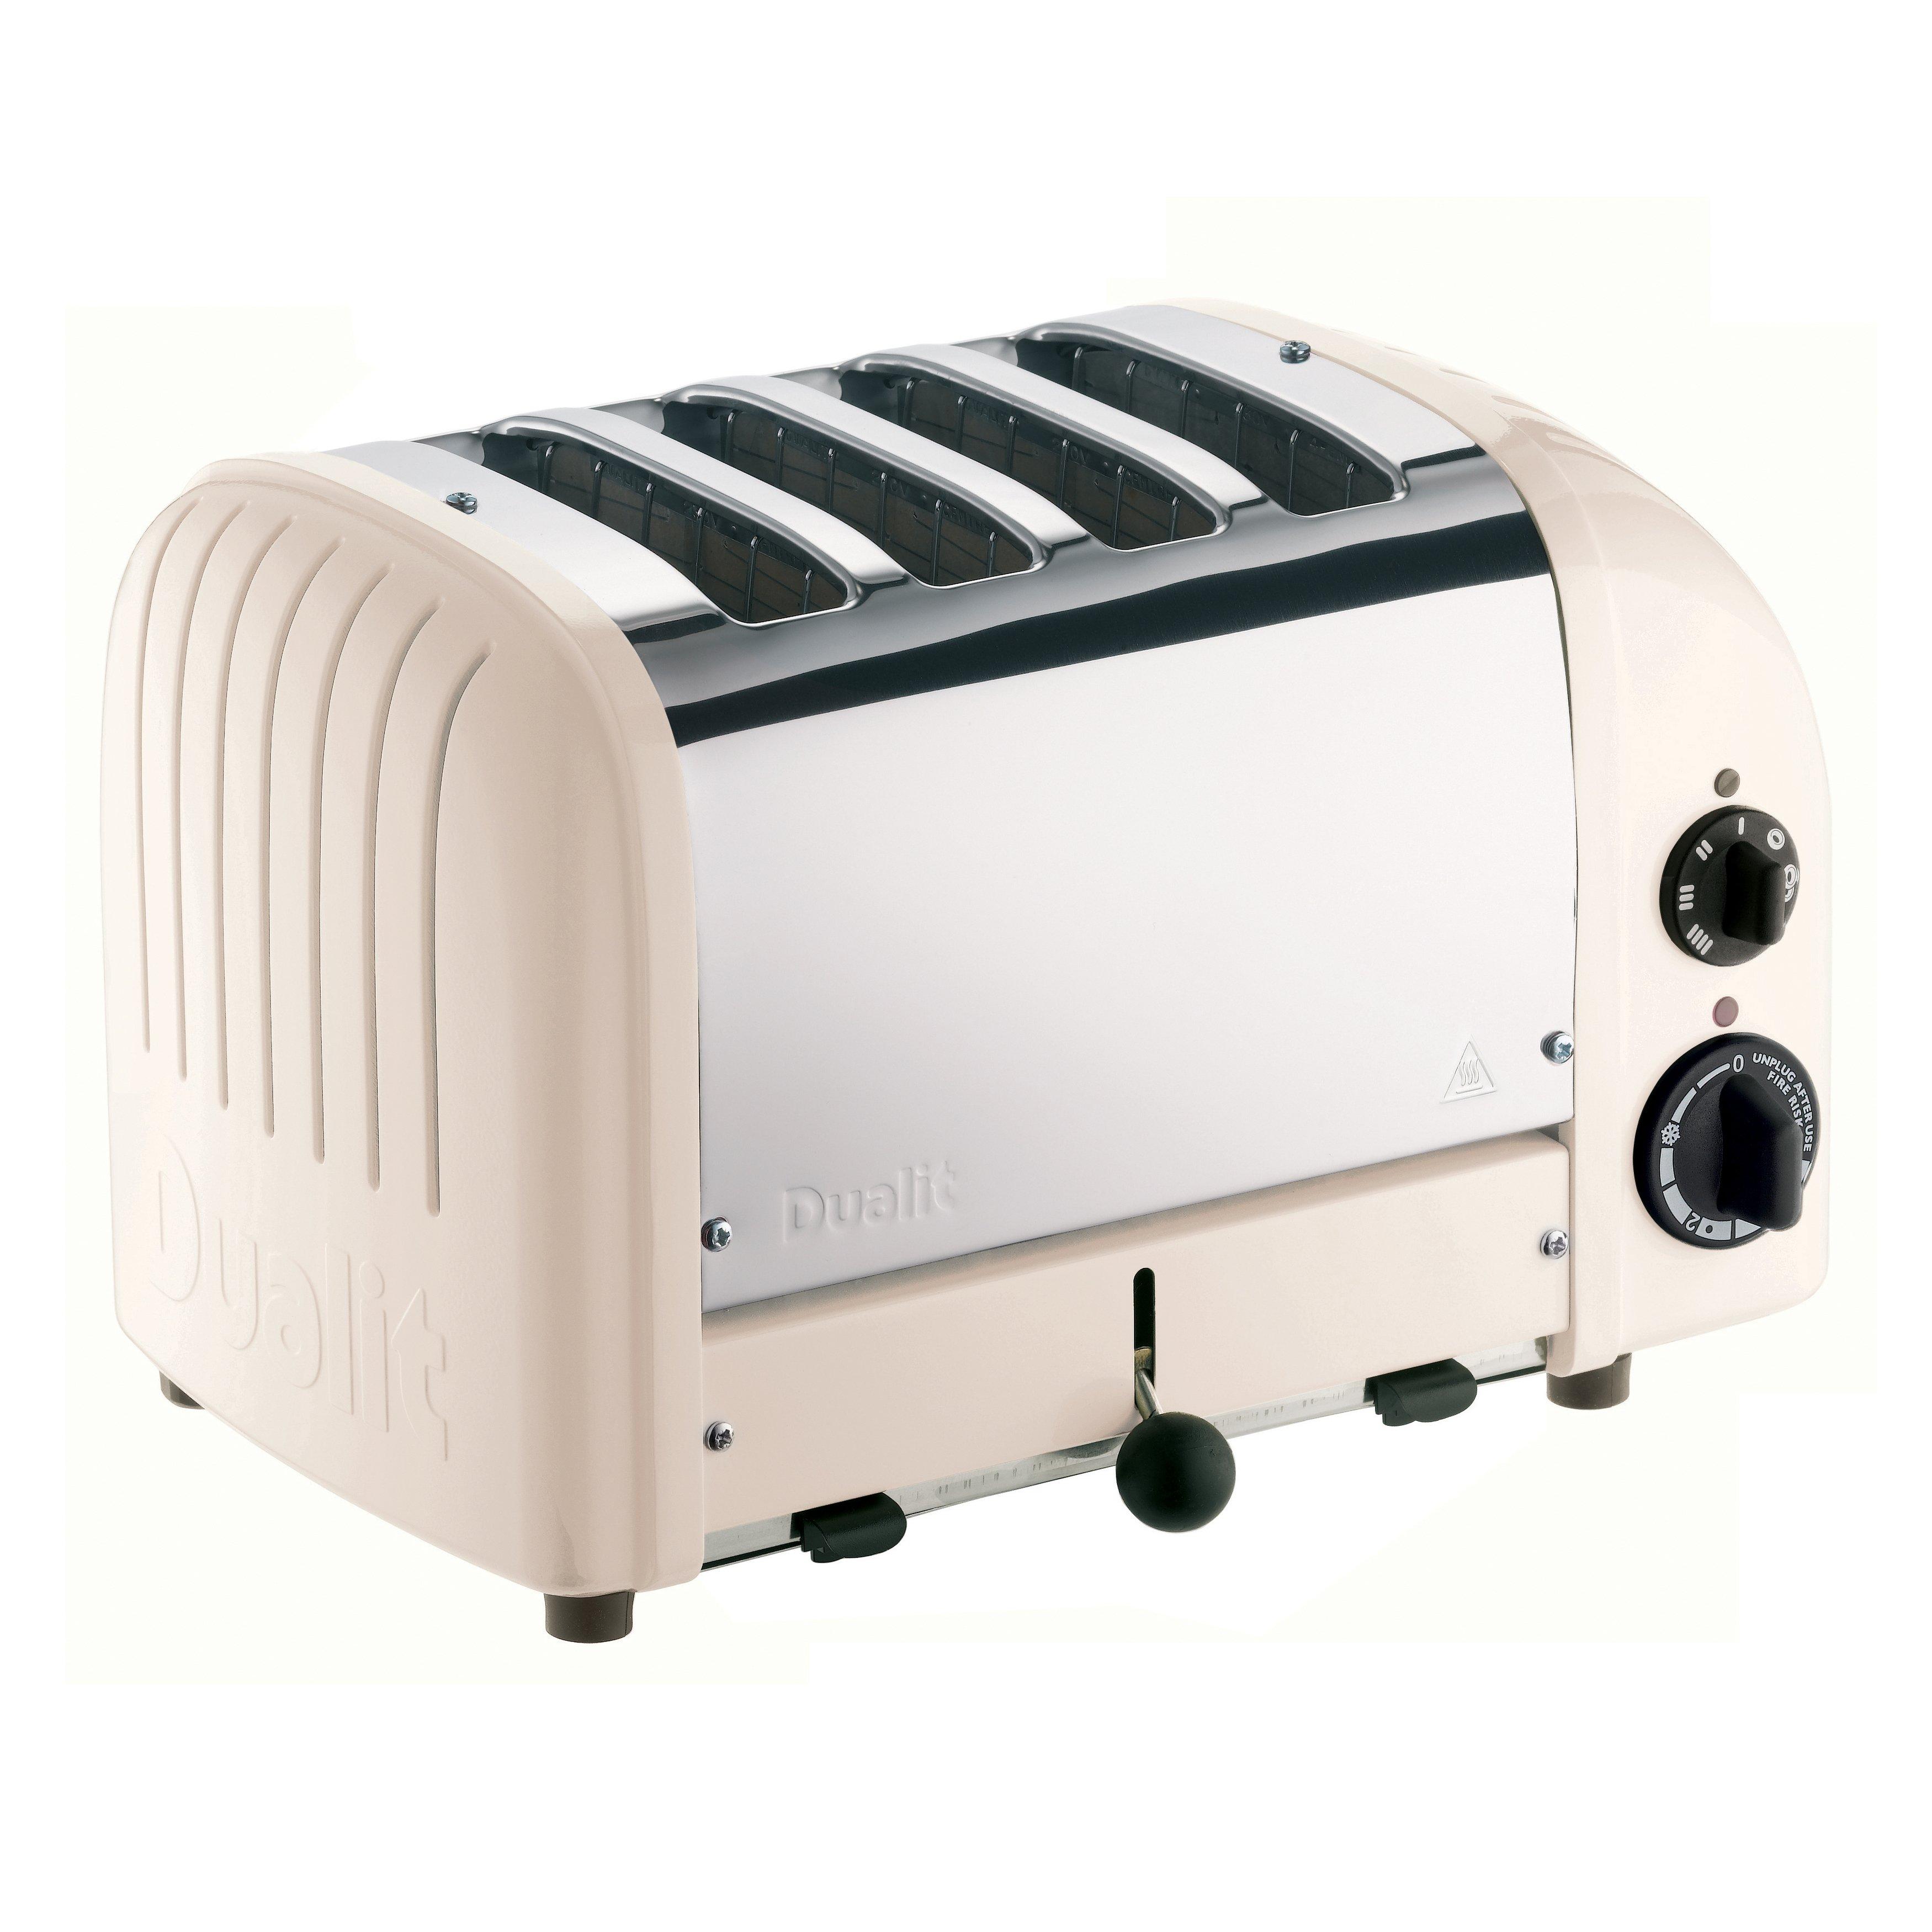 Dualit 47445 NewGen 4-Slice Toaster - Powder